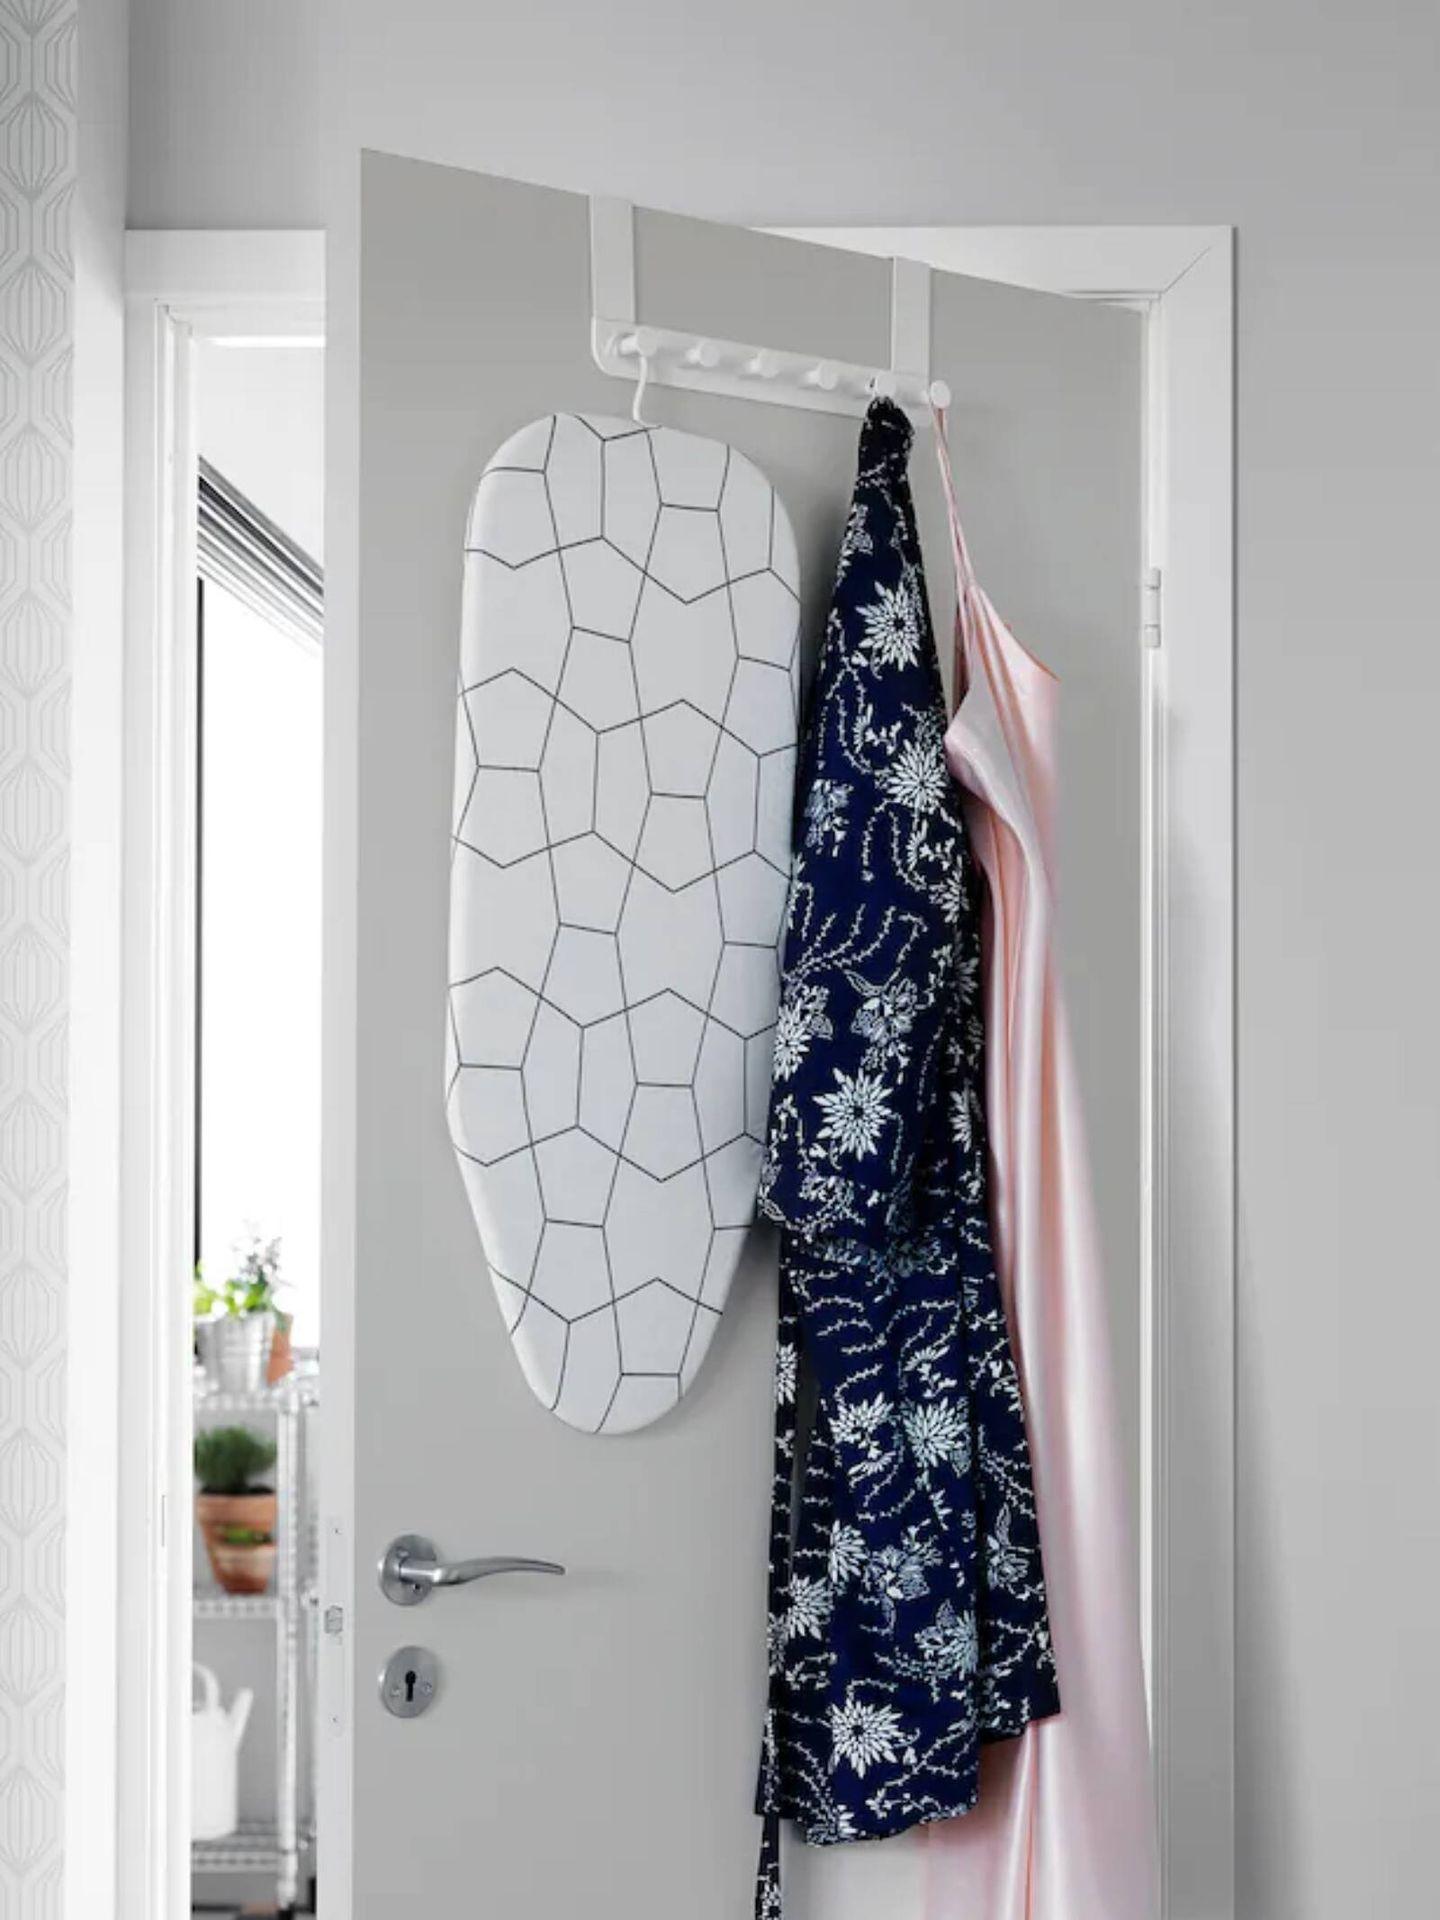 Básicos de Ikea por menos de 5 euros para decorar tu casa. (Cortesía)